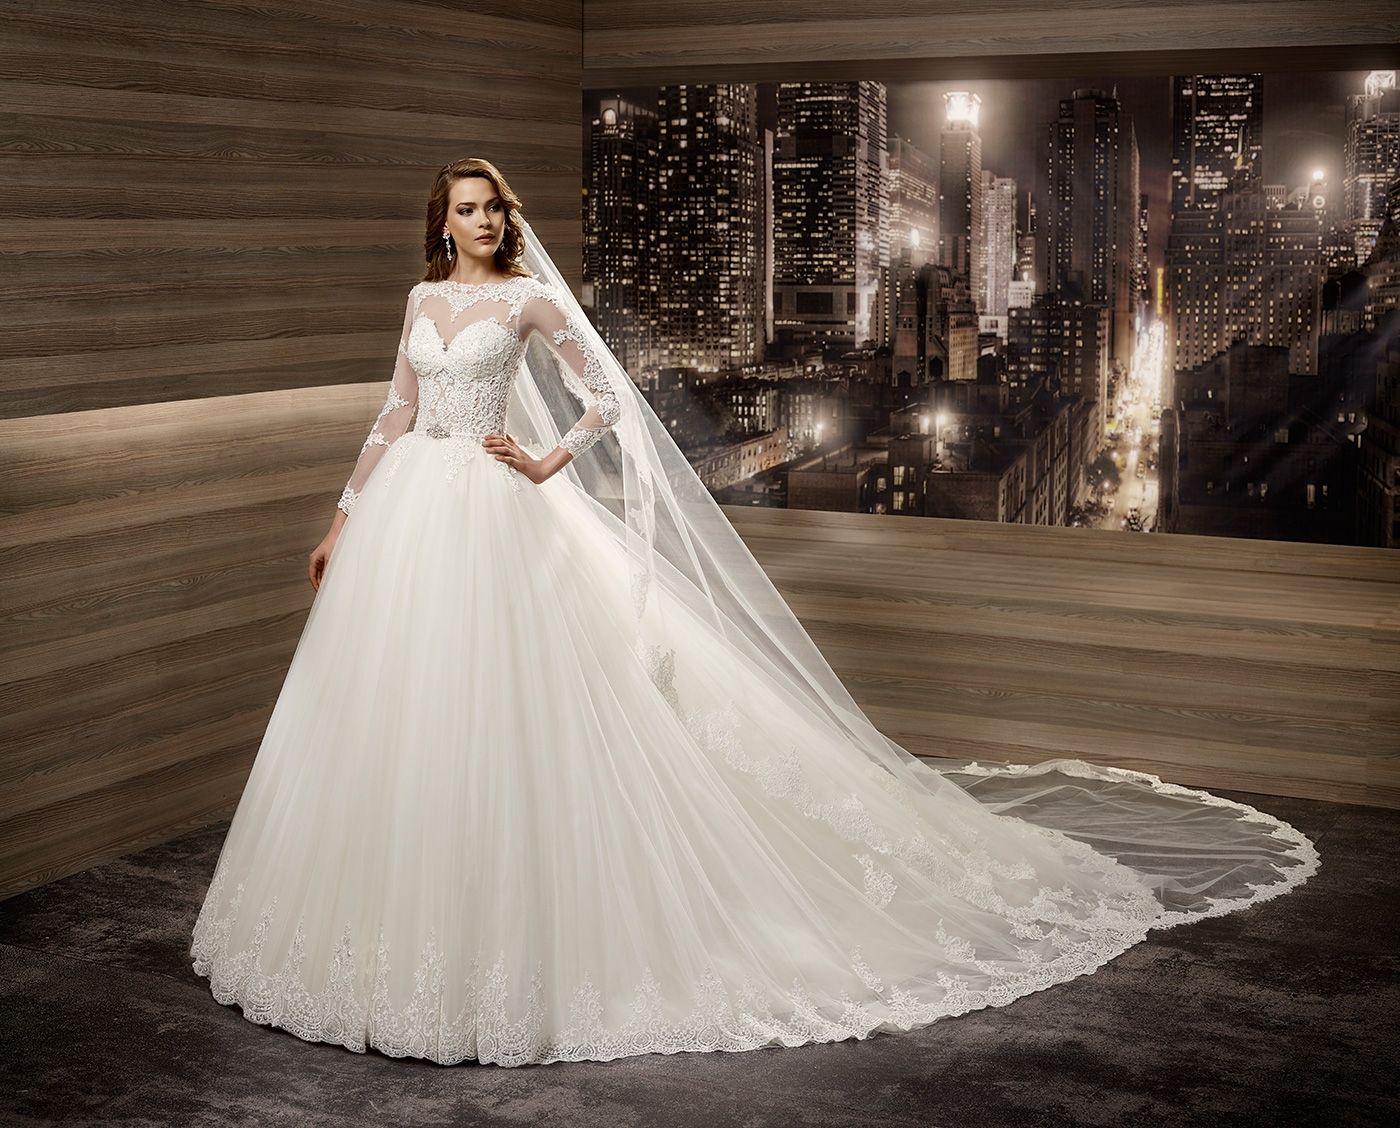 Emerald wedding dress  Wedding Dress Romance ROAB   ROMANCE  Pinterest  Romance